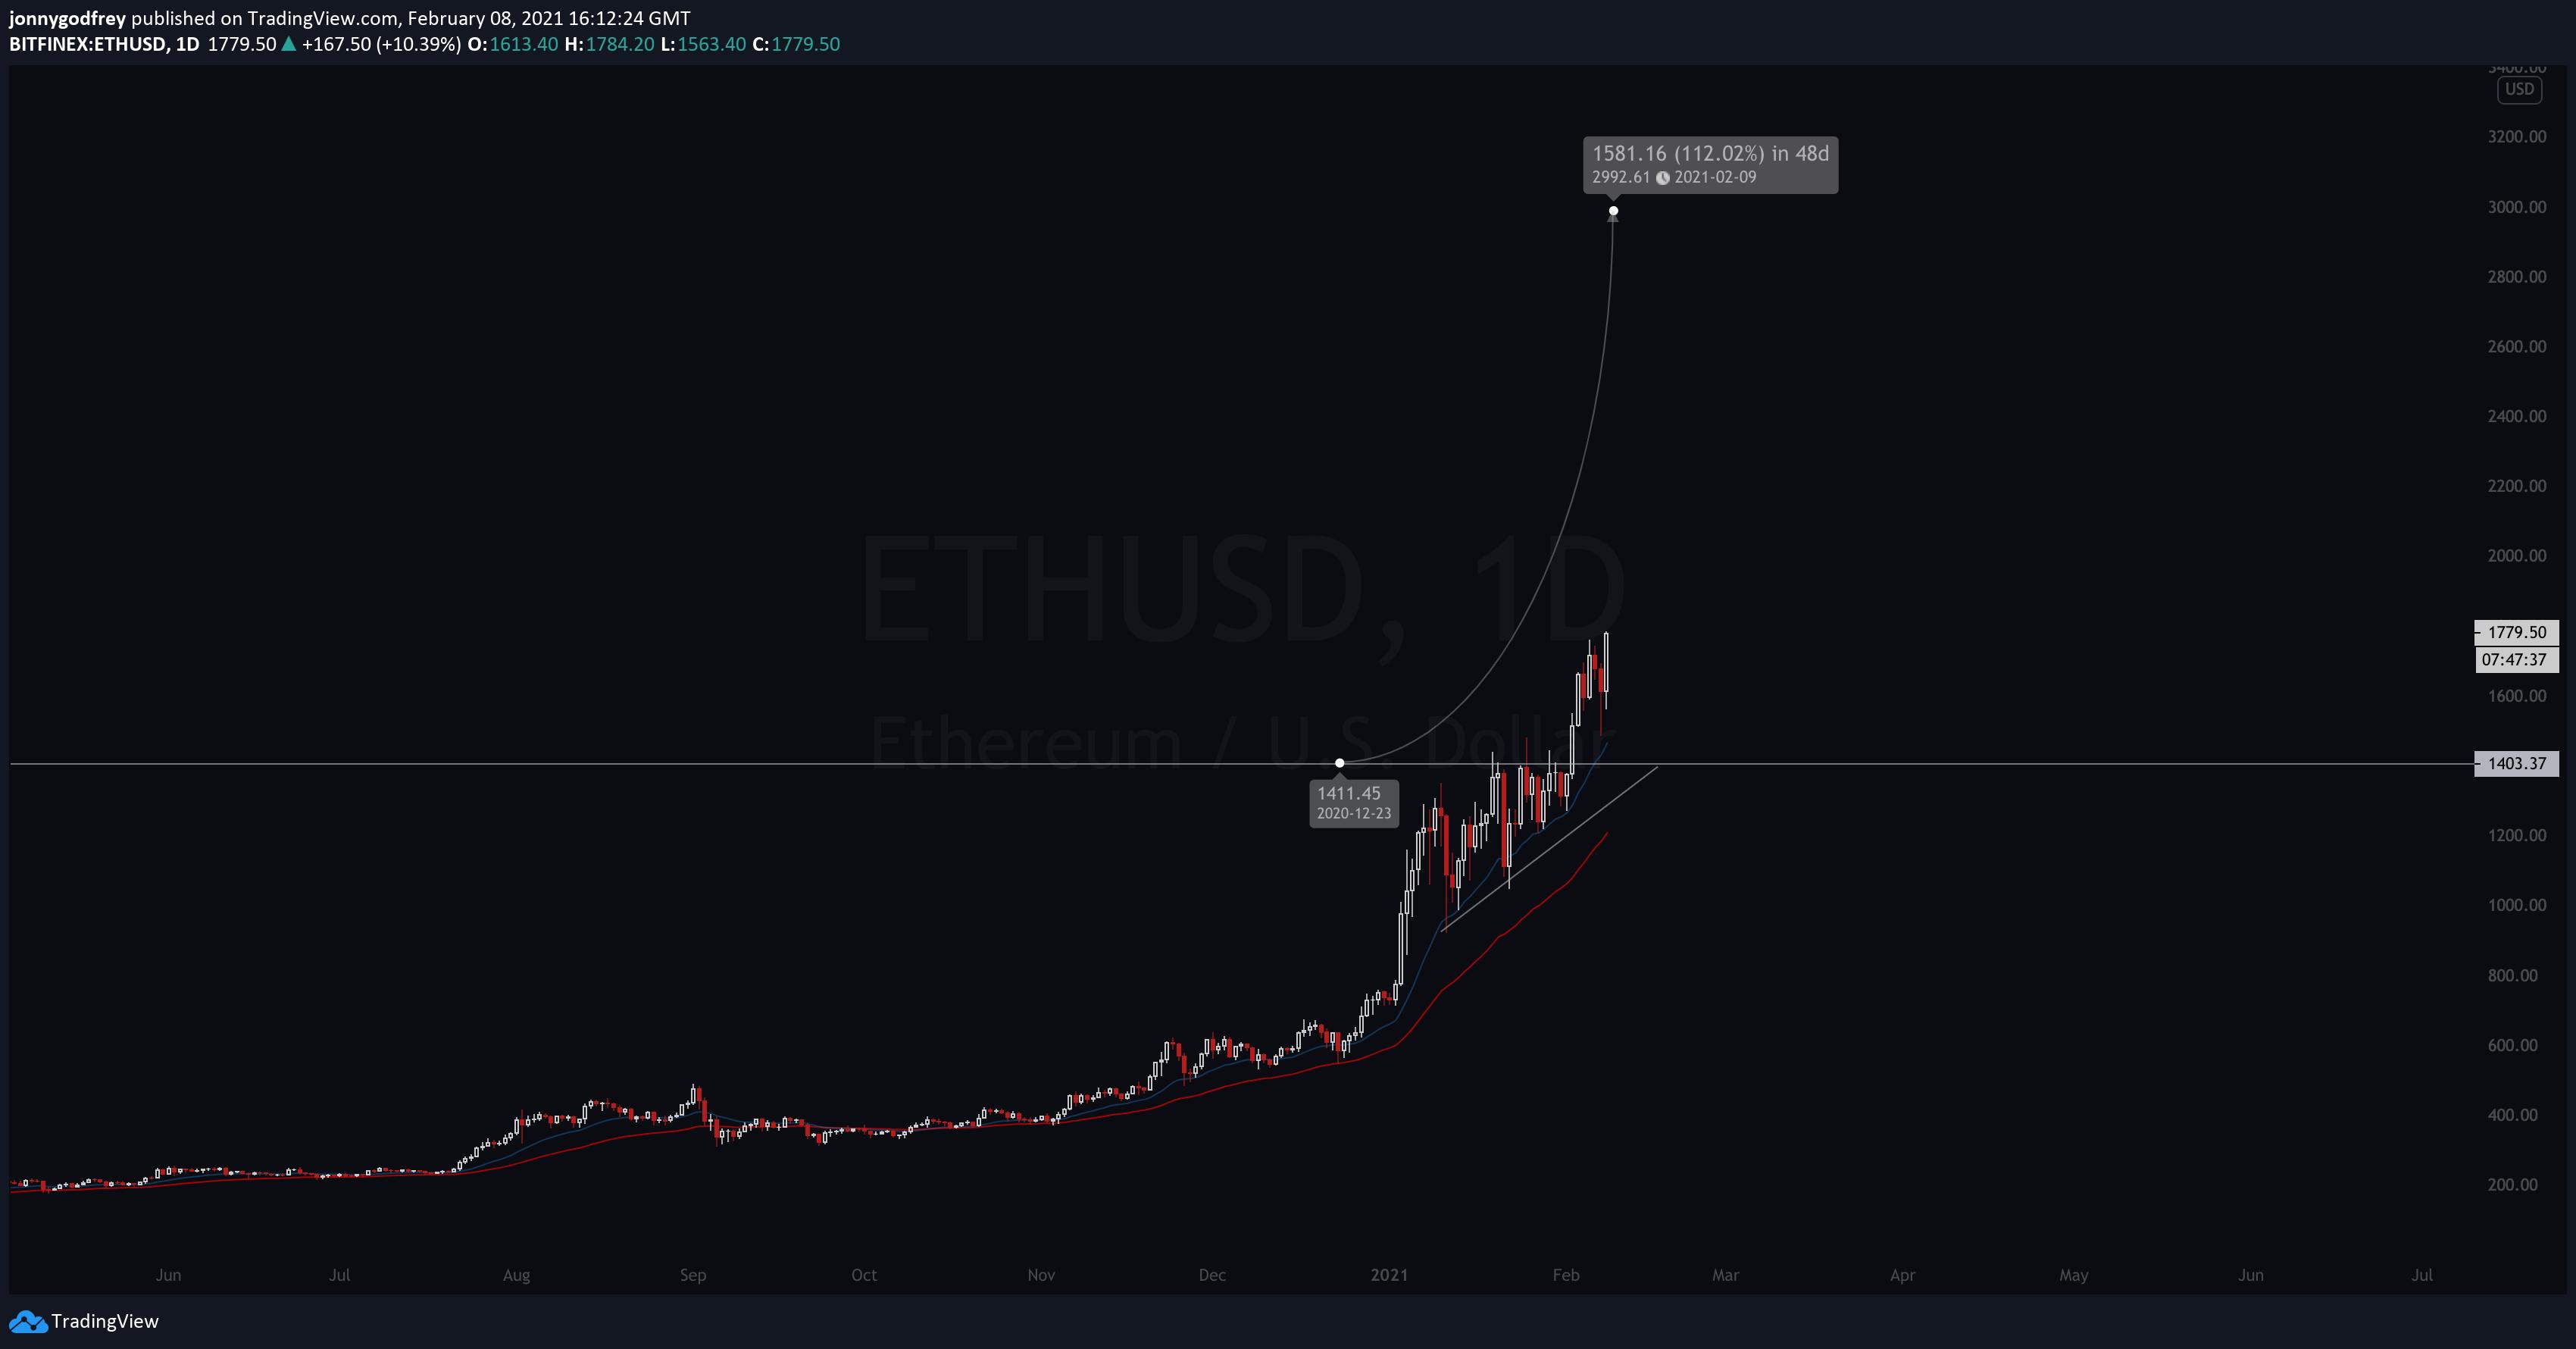 ETHUSD daily chart